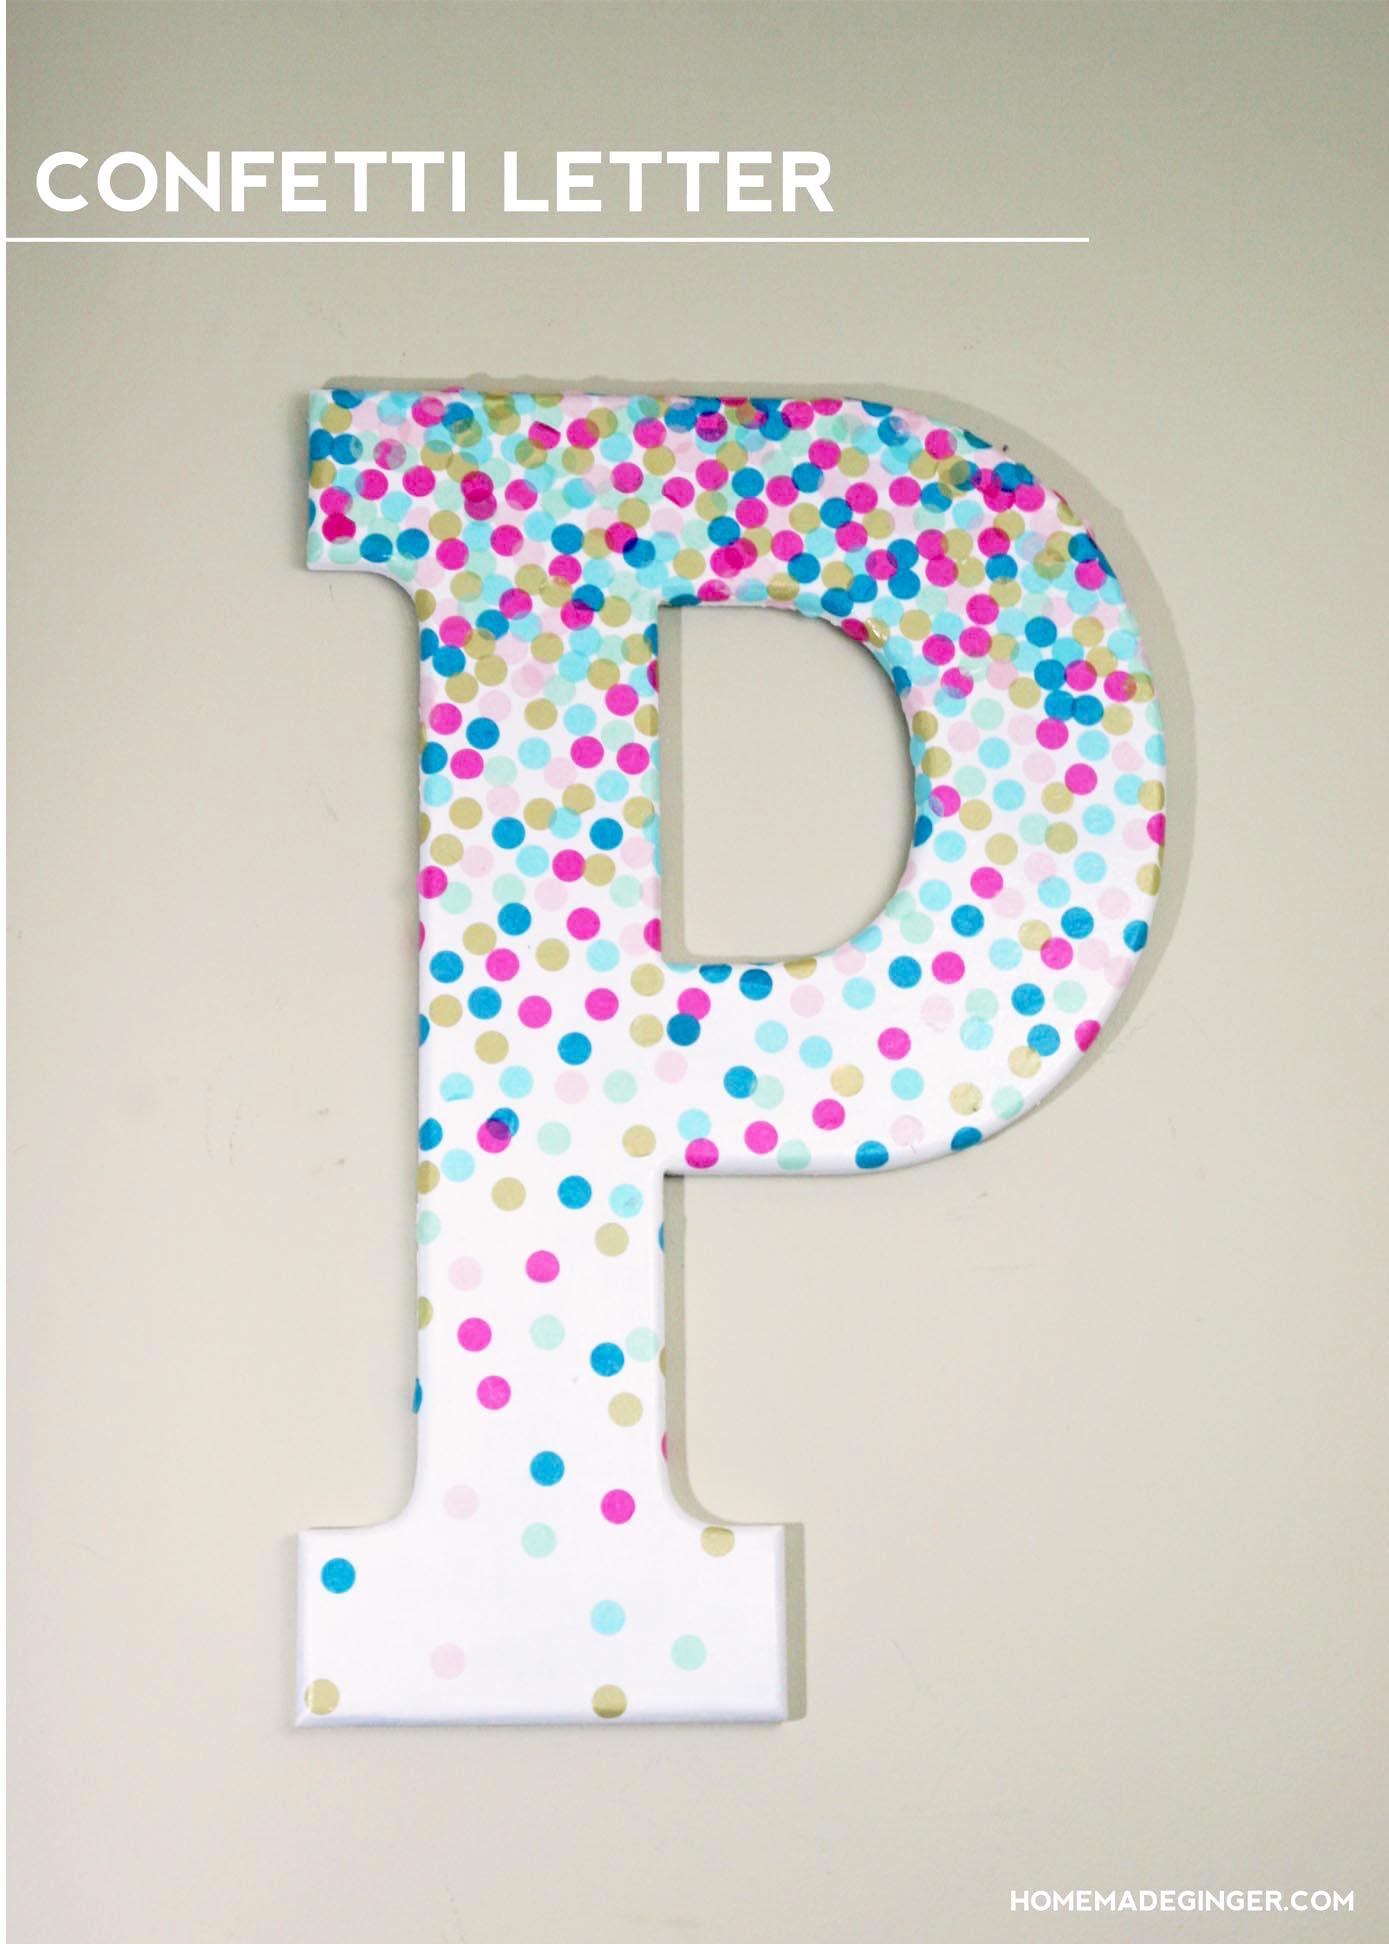 DIY Confetti Letter for Home Decor  BigDIYIdeascom